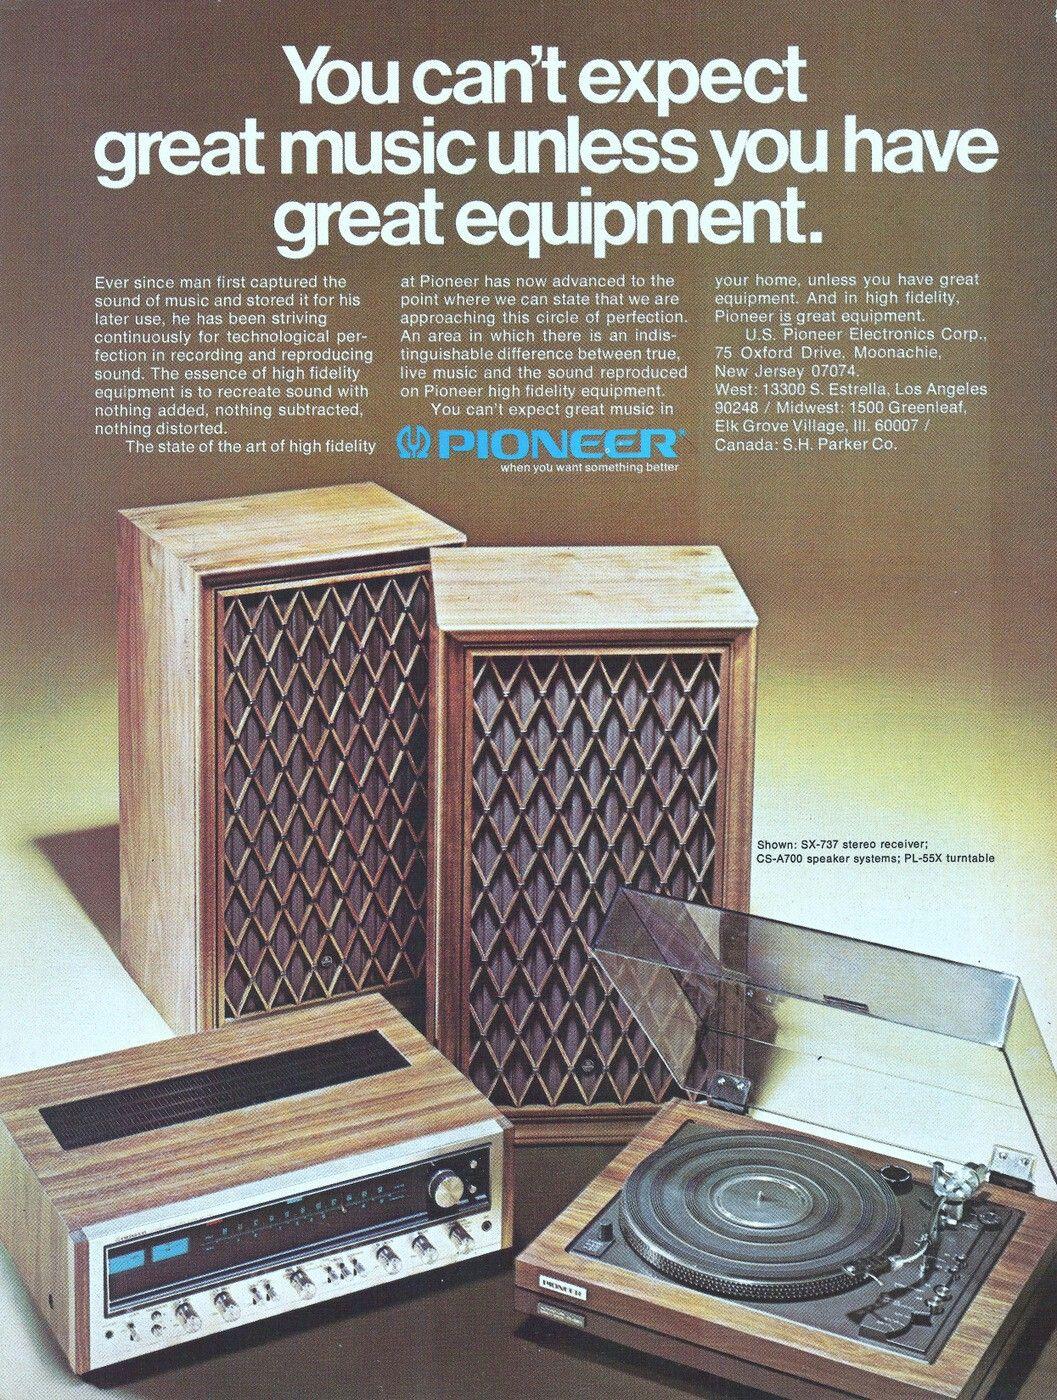 70 S Pioneer Stereo Vintage Speakers Vintage Electronics Vintage Radio